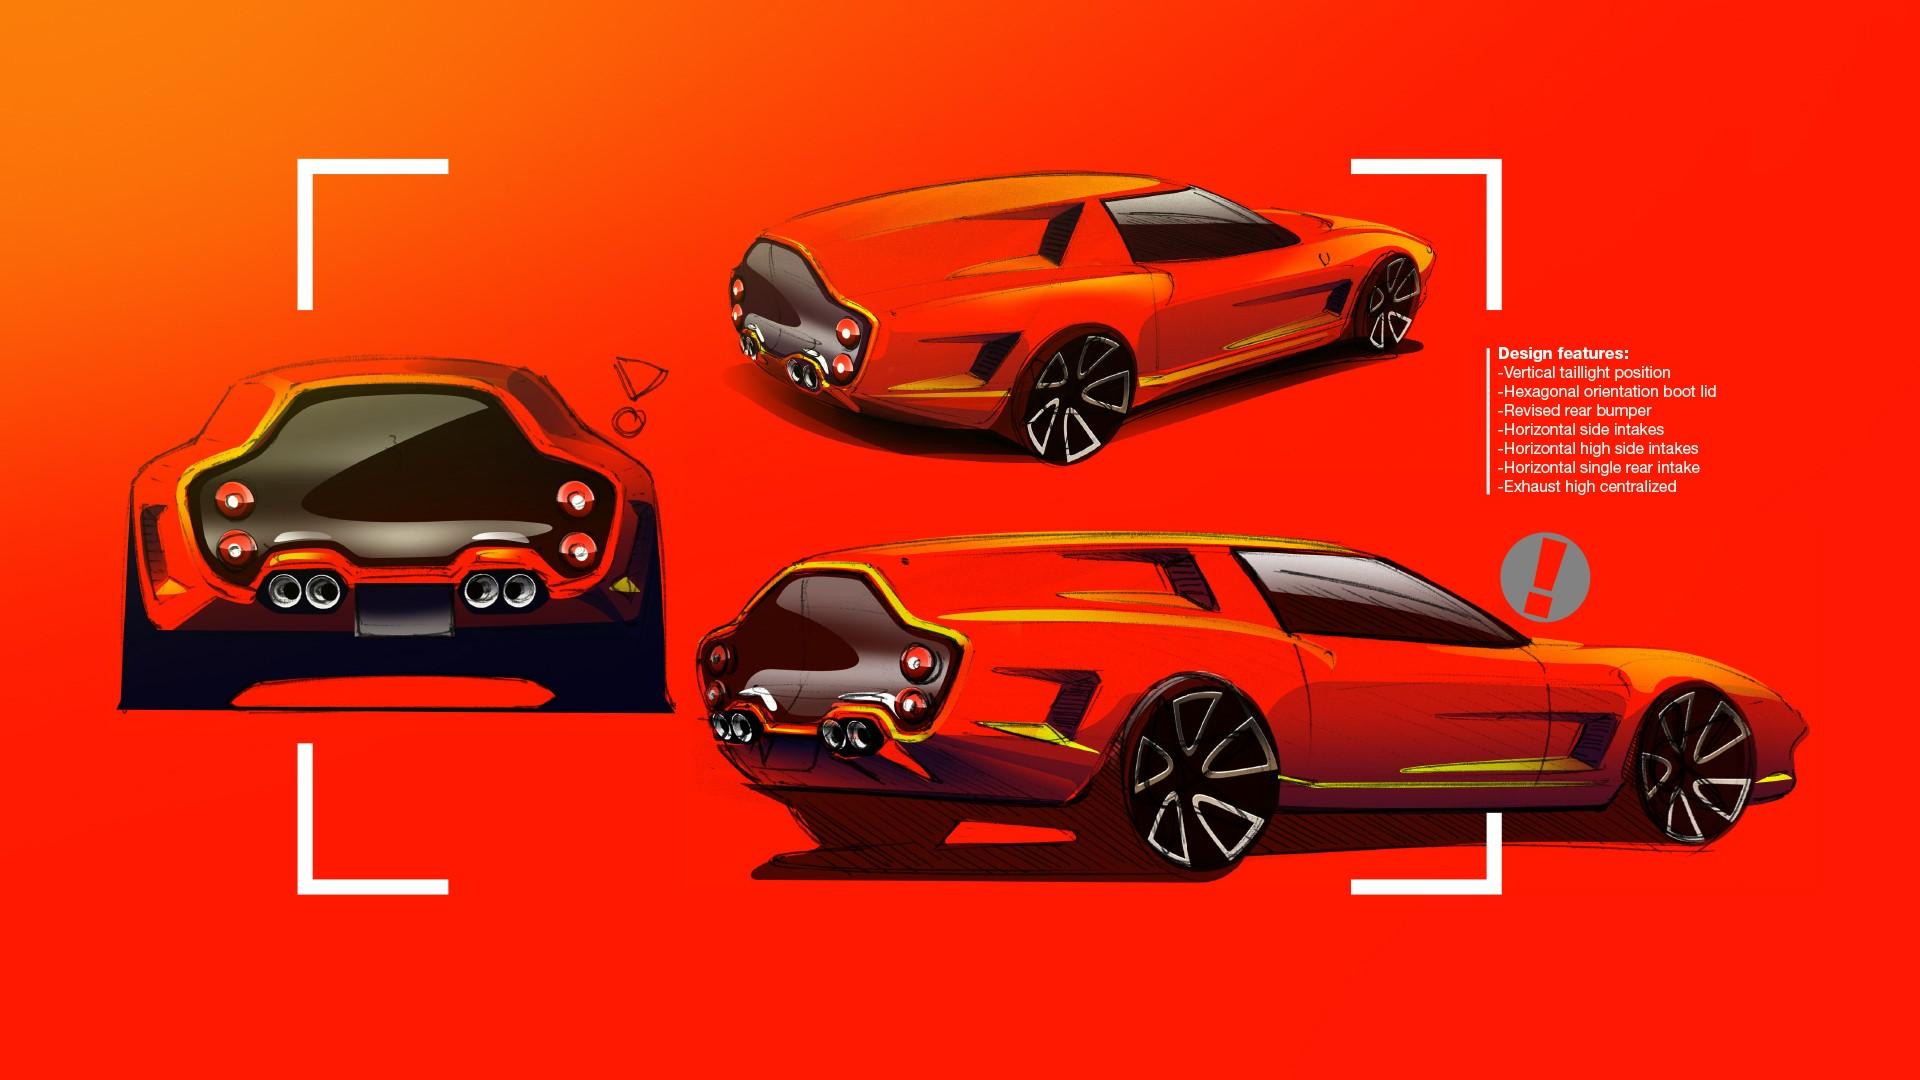 18 12 26 Niels van Roij Design - Breadvan Hommage ideation board 011